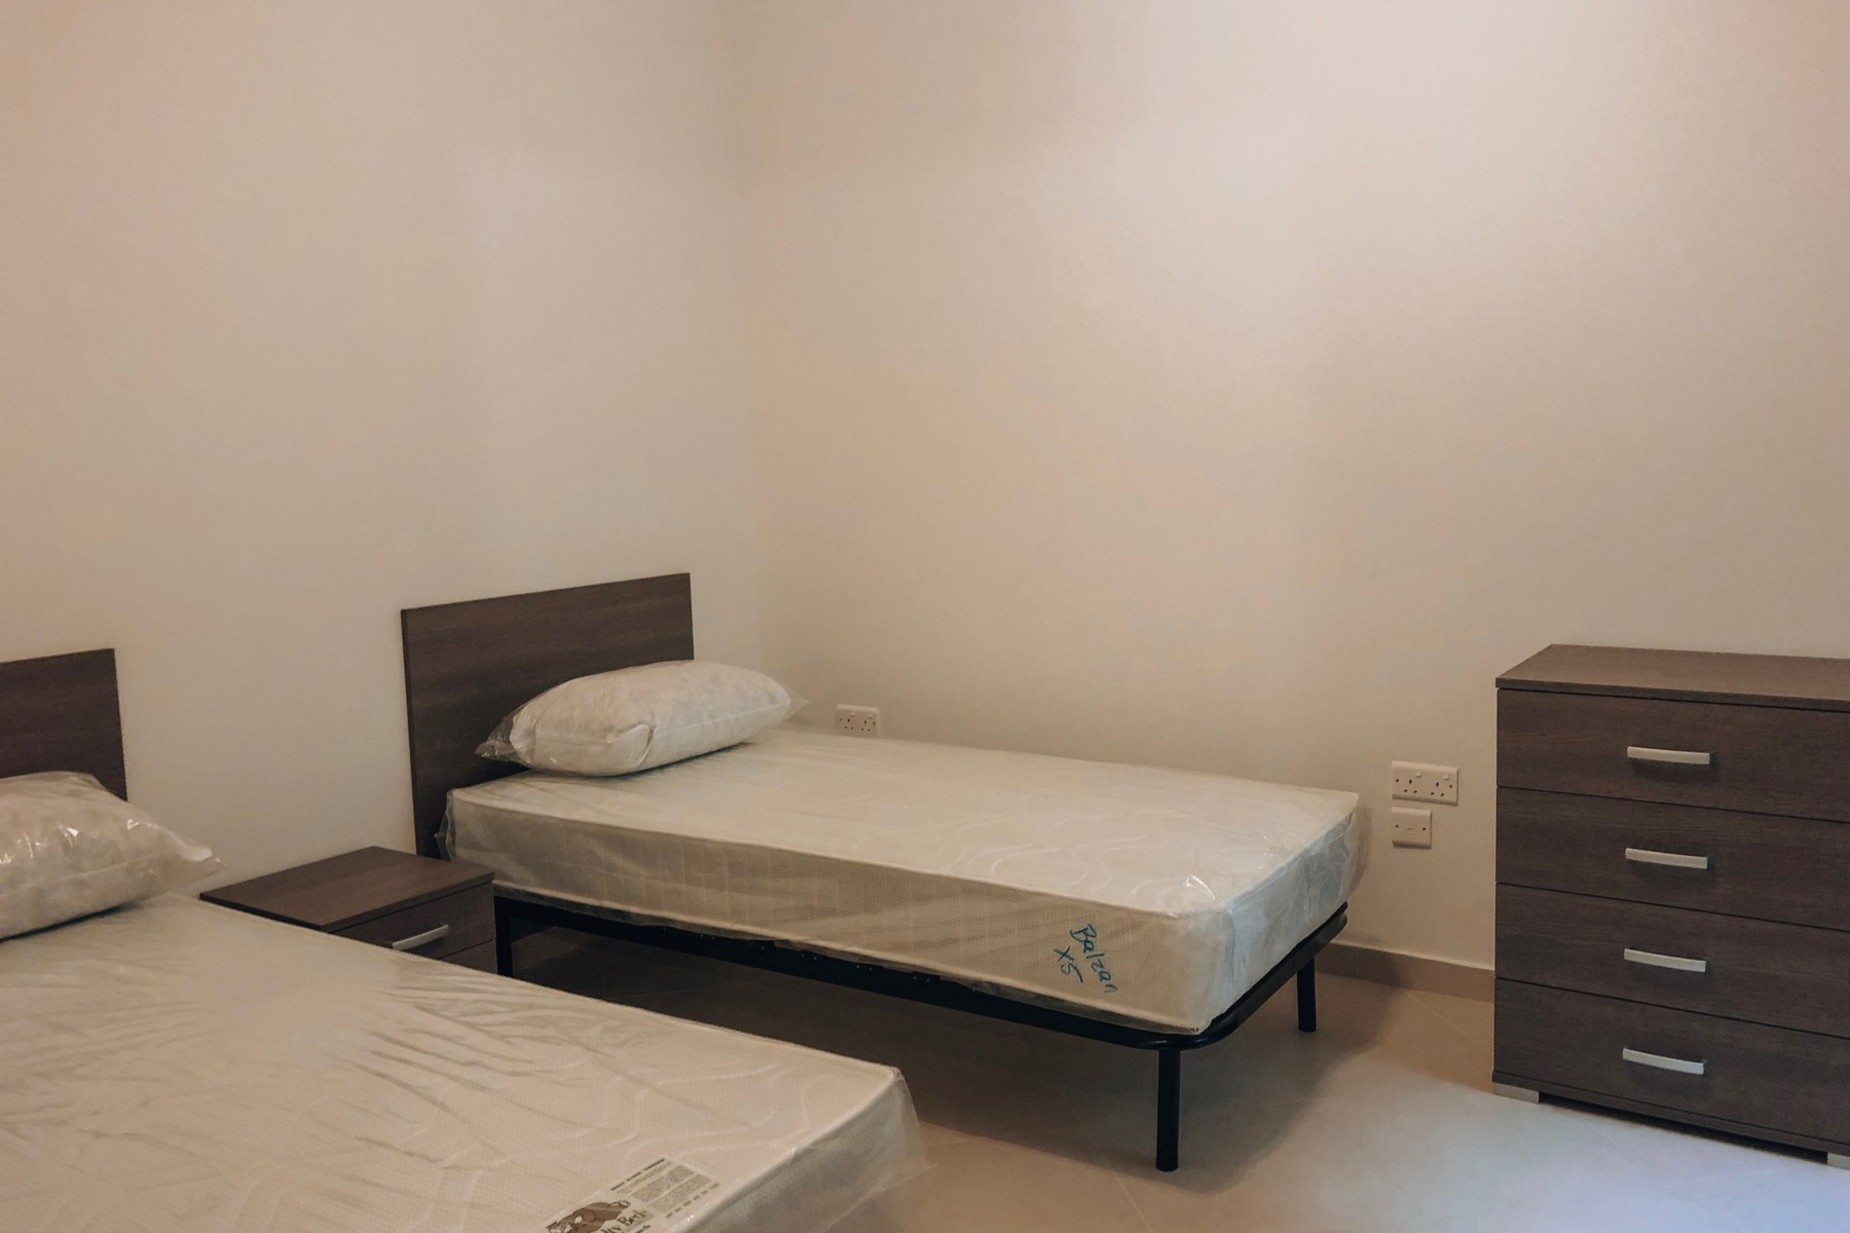 3 bed Apartment For Rent in Balzan, Balzan - thumb 8